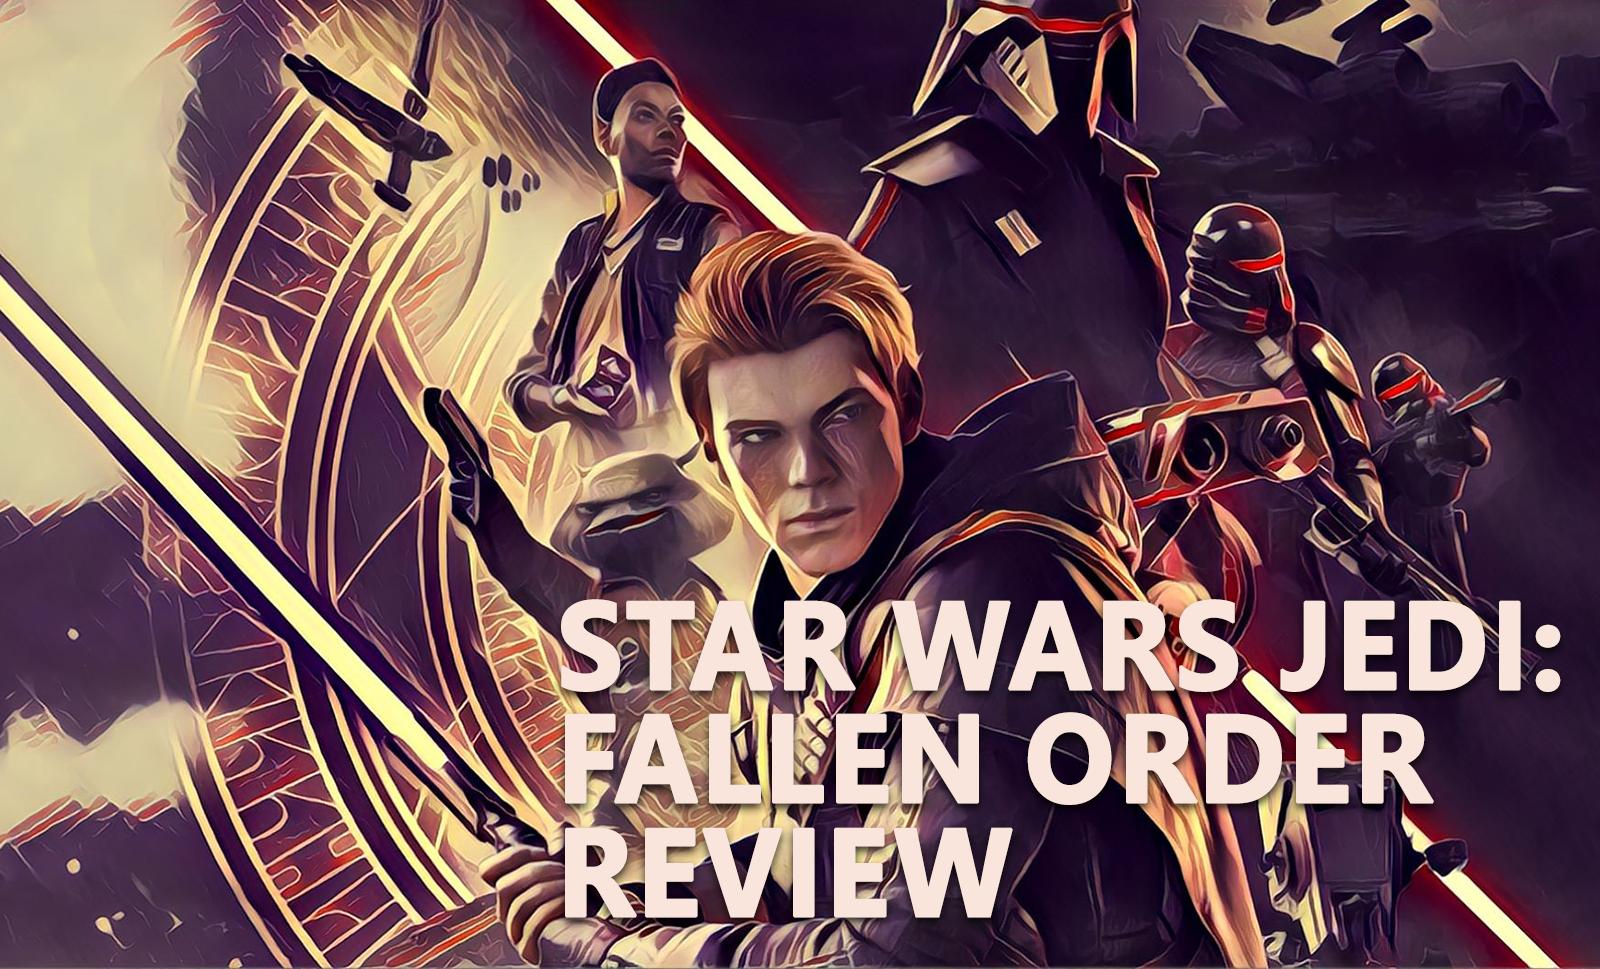 Star Wars Jedi Fallen Order Review A Series Defining Adventure Venturebeat